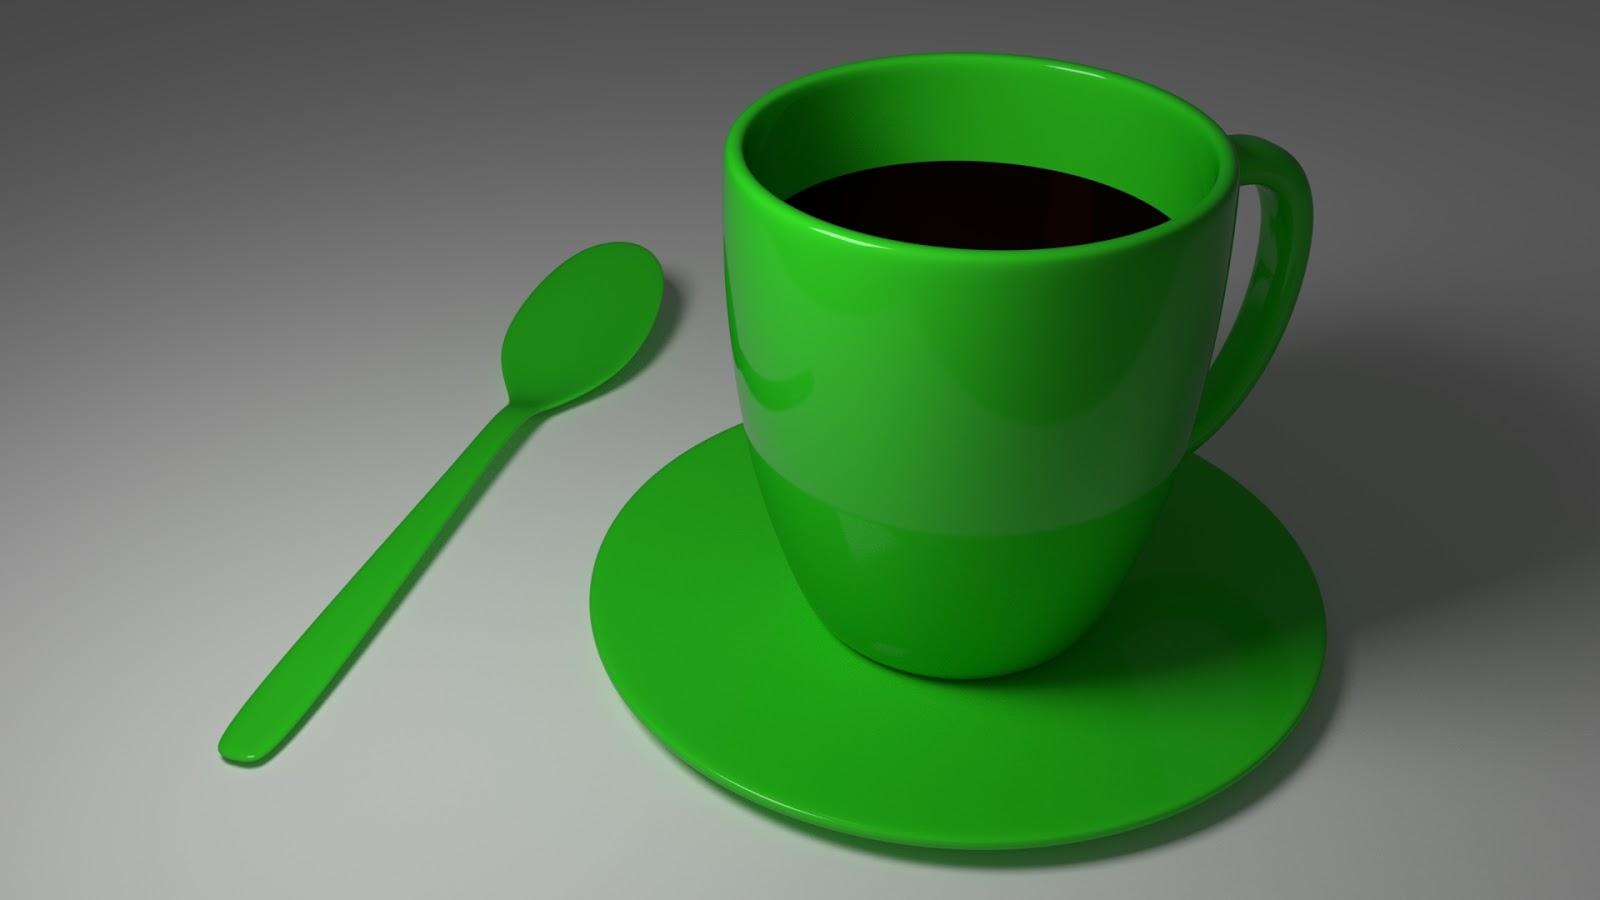 Free 3D Plastic Mug .blend file